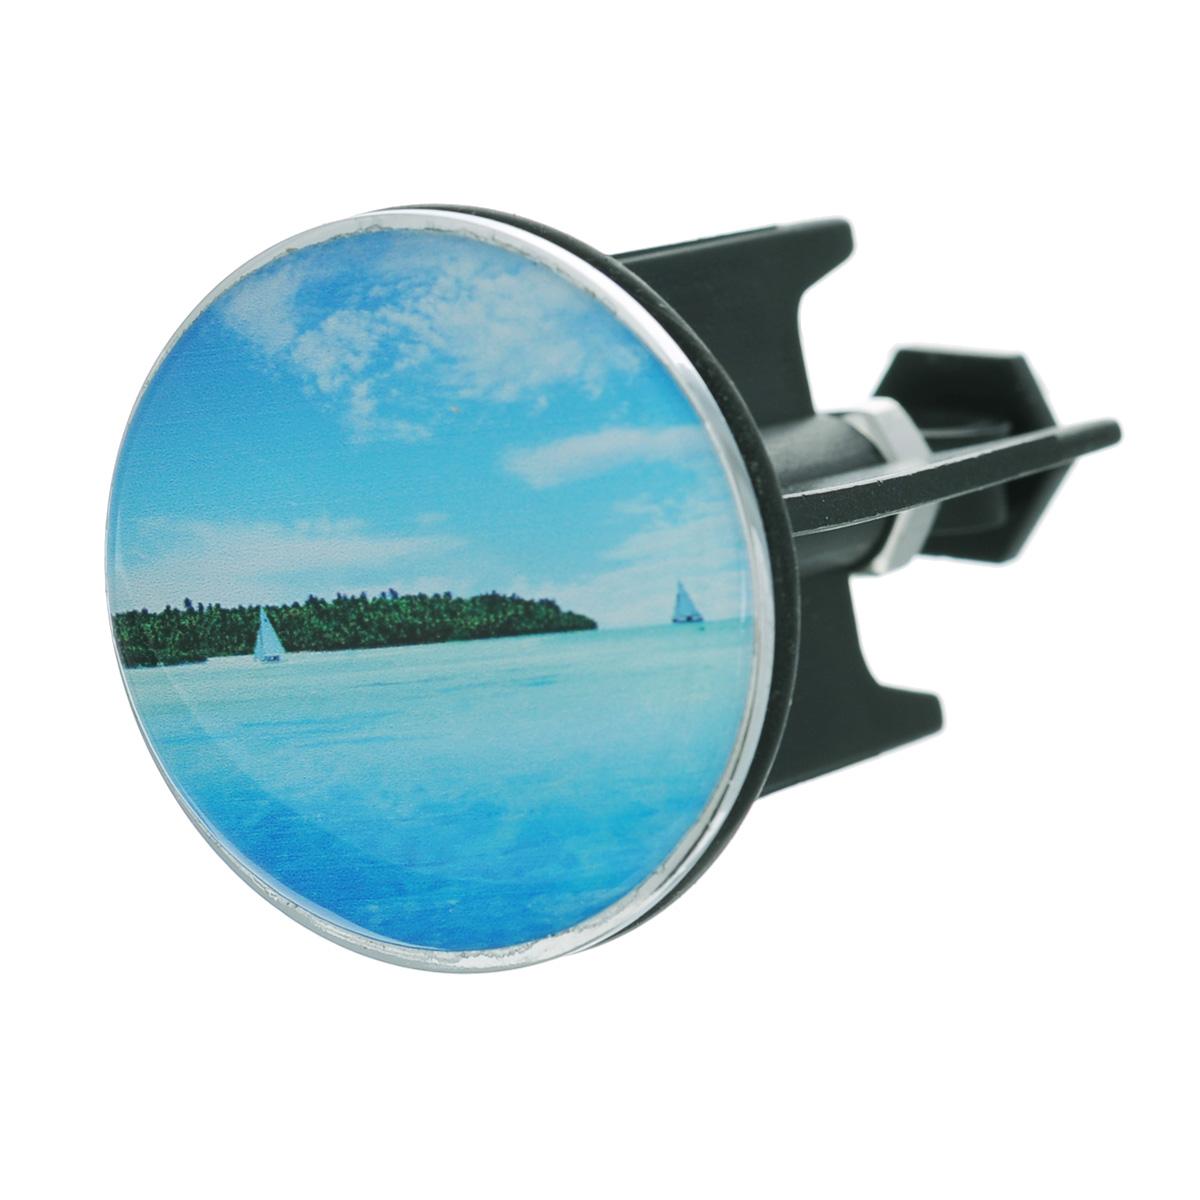 Пробка для раковины Wenko Island, диаметр 4 см20761100